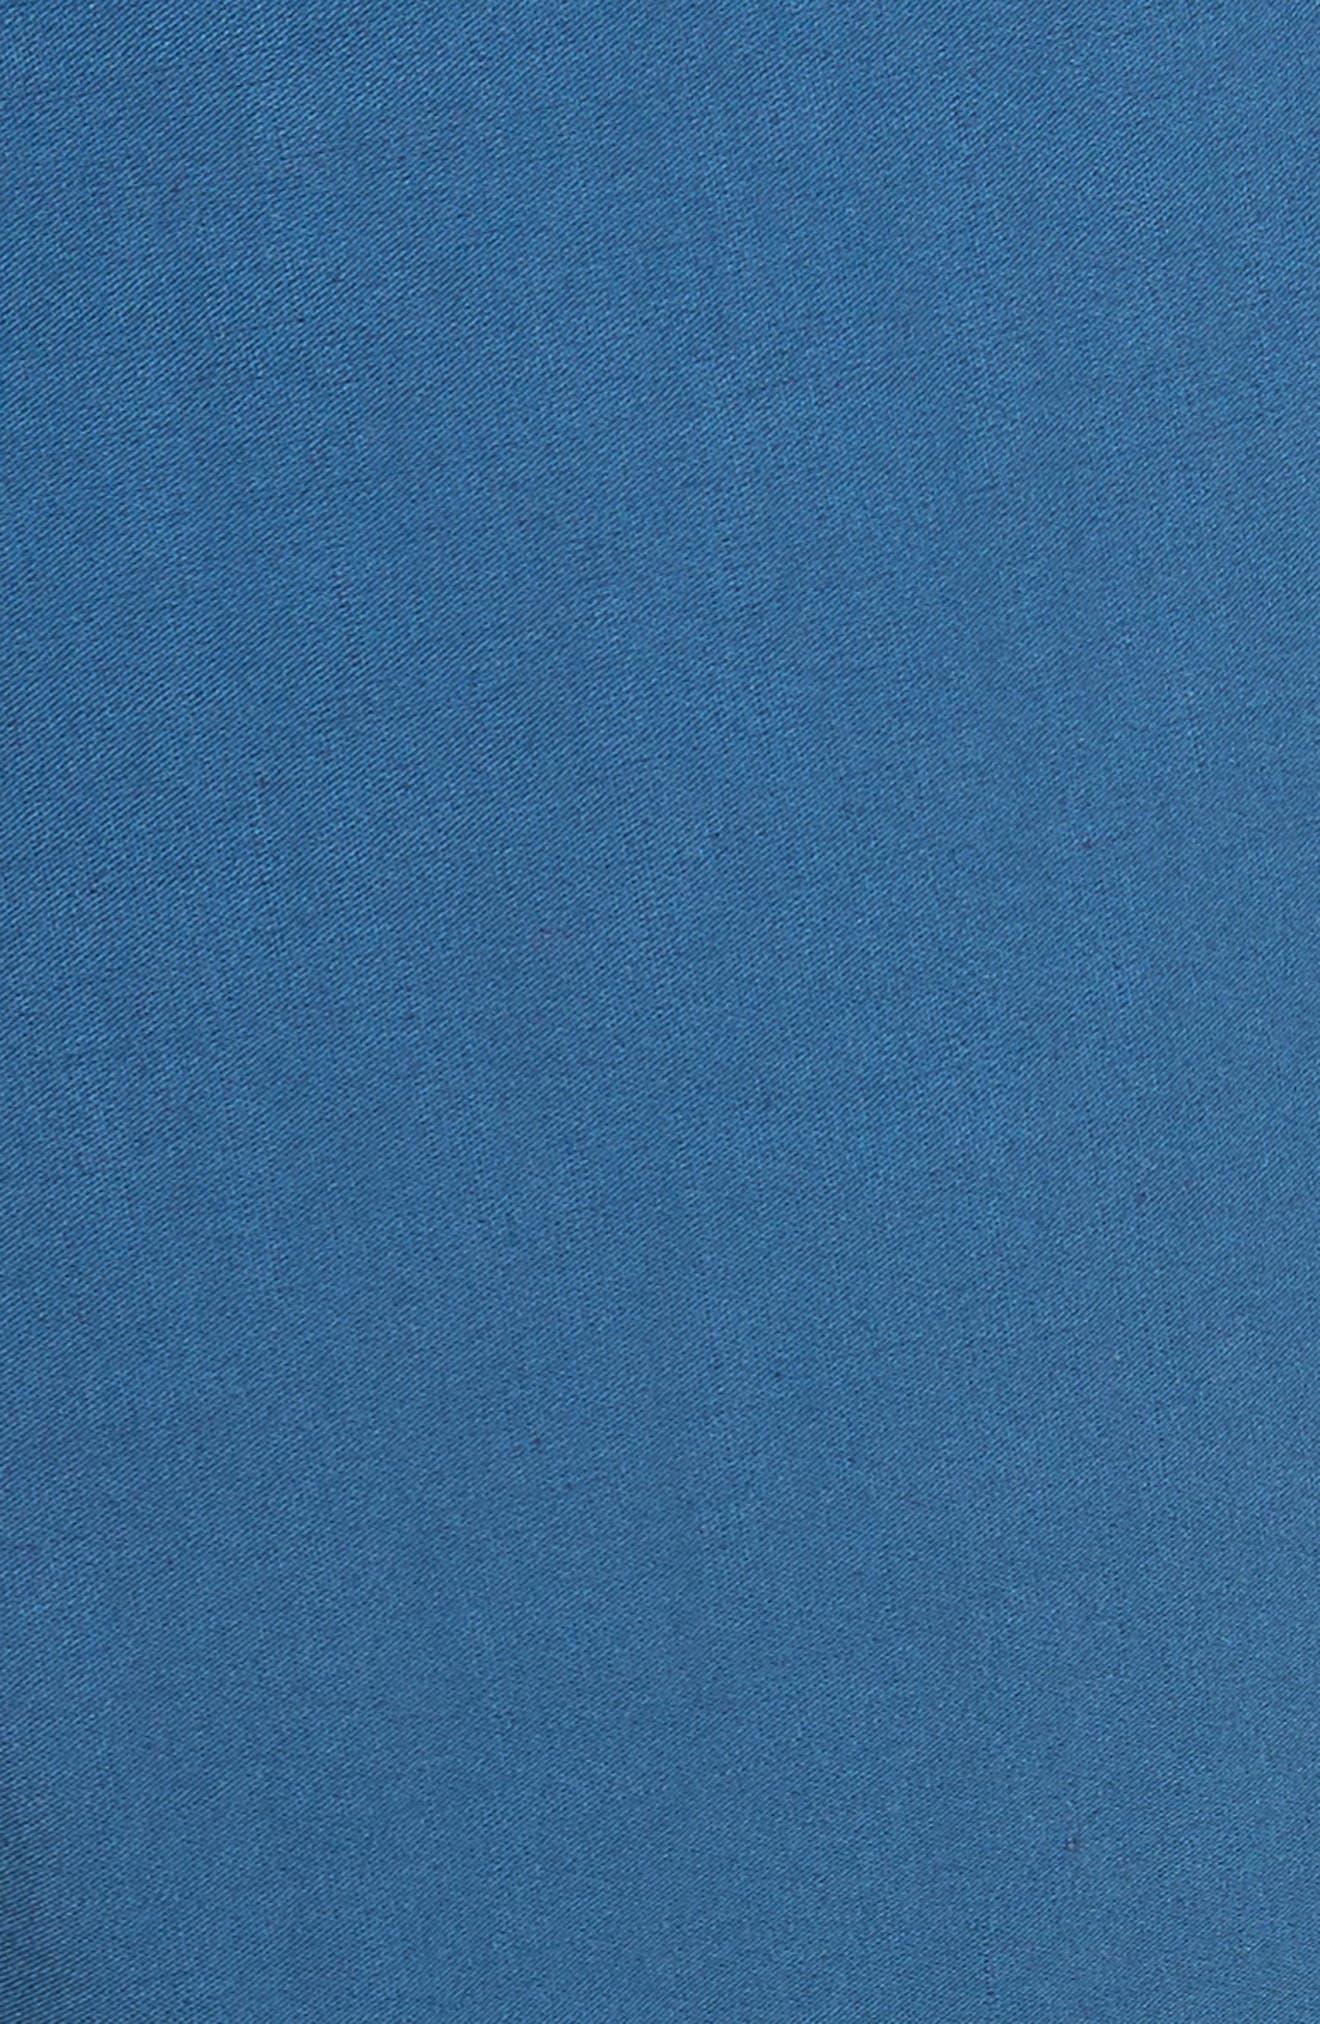 Winona Cuff Wide Leg Pants,                             Alternate thumbnail 5, color,                             Blue